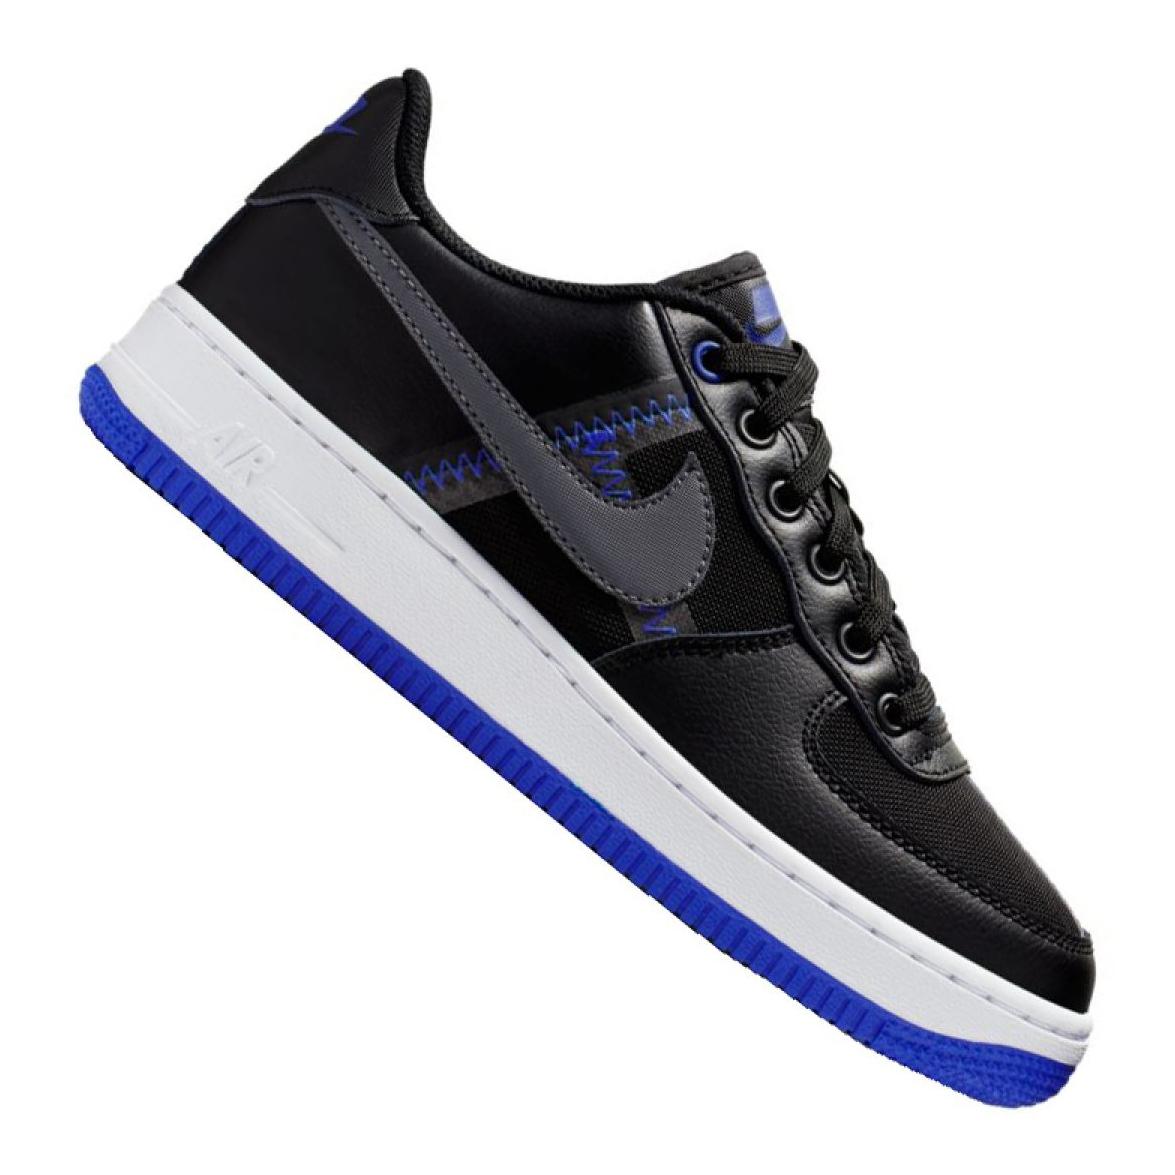 Sapatilhas Nike Air Force 1 LV8 1 Jr AV0743 002 preto